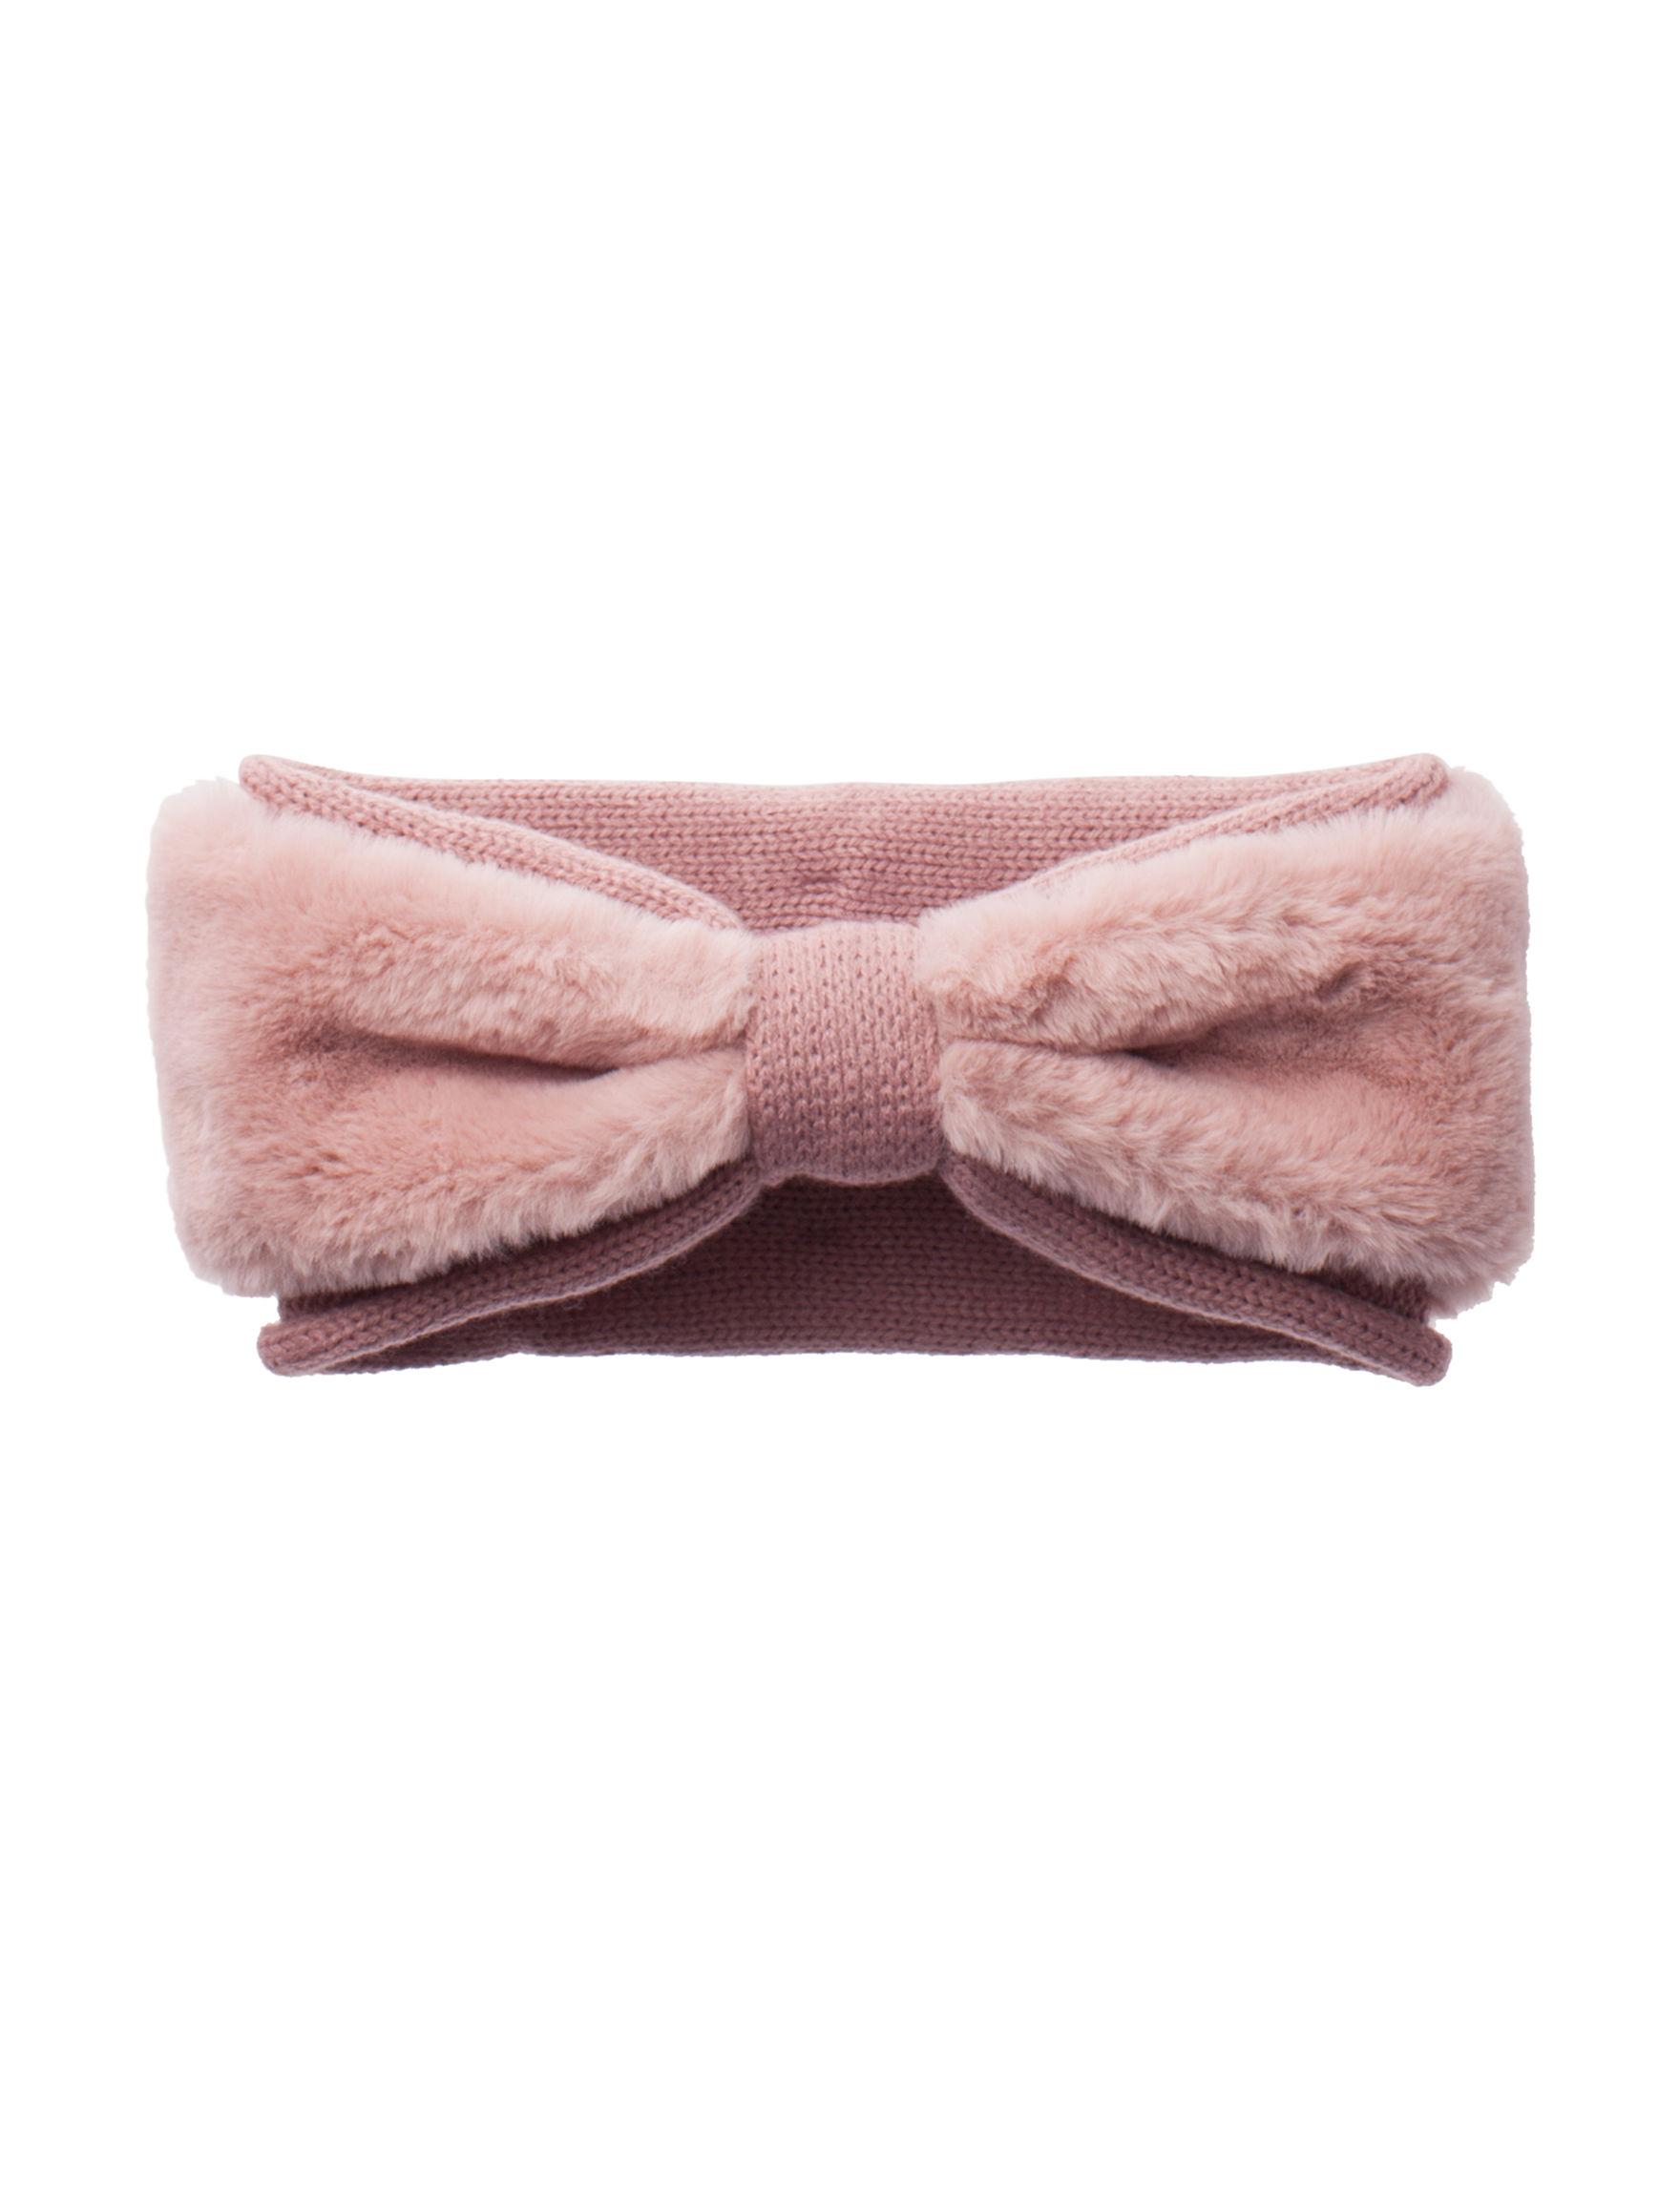 David & Young Dark Pink Hats & Headwear